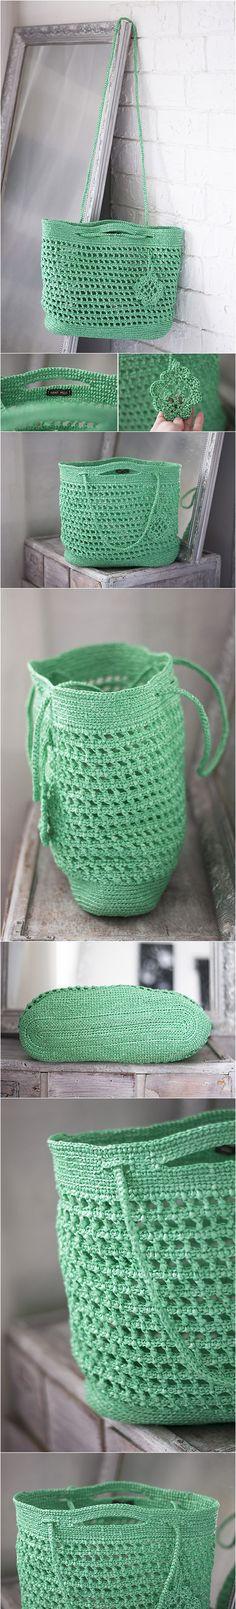 Green Crochet Bag, Large Eco Friendly from Upcycled Bags, Plastic Yarn Handbag, Big Lightweight Grass OOAK, Tote Summer, Spring Beach Plarn Bag, St Patricks Day bag, irish bag, st paddy's day bag, patrick bag, green bag, eco bag